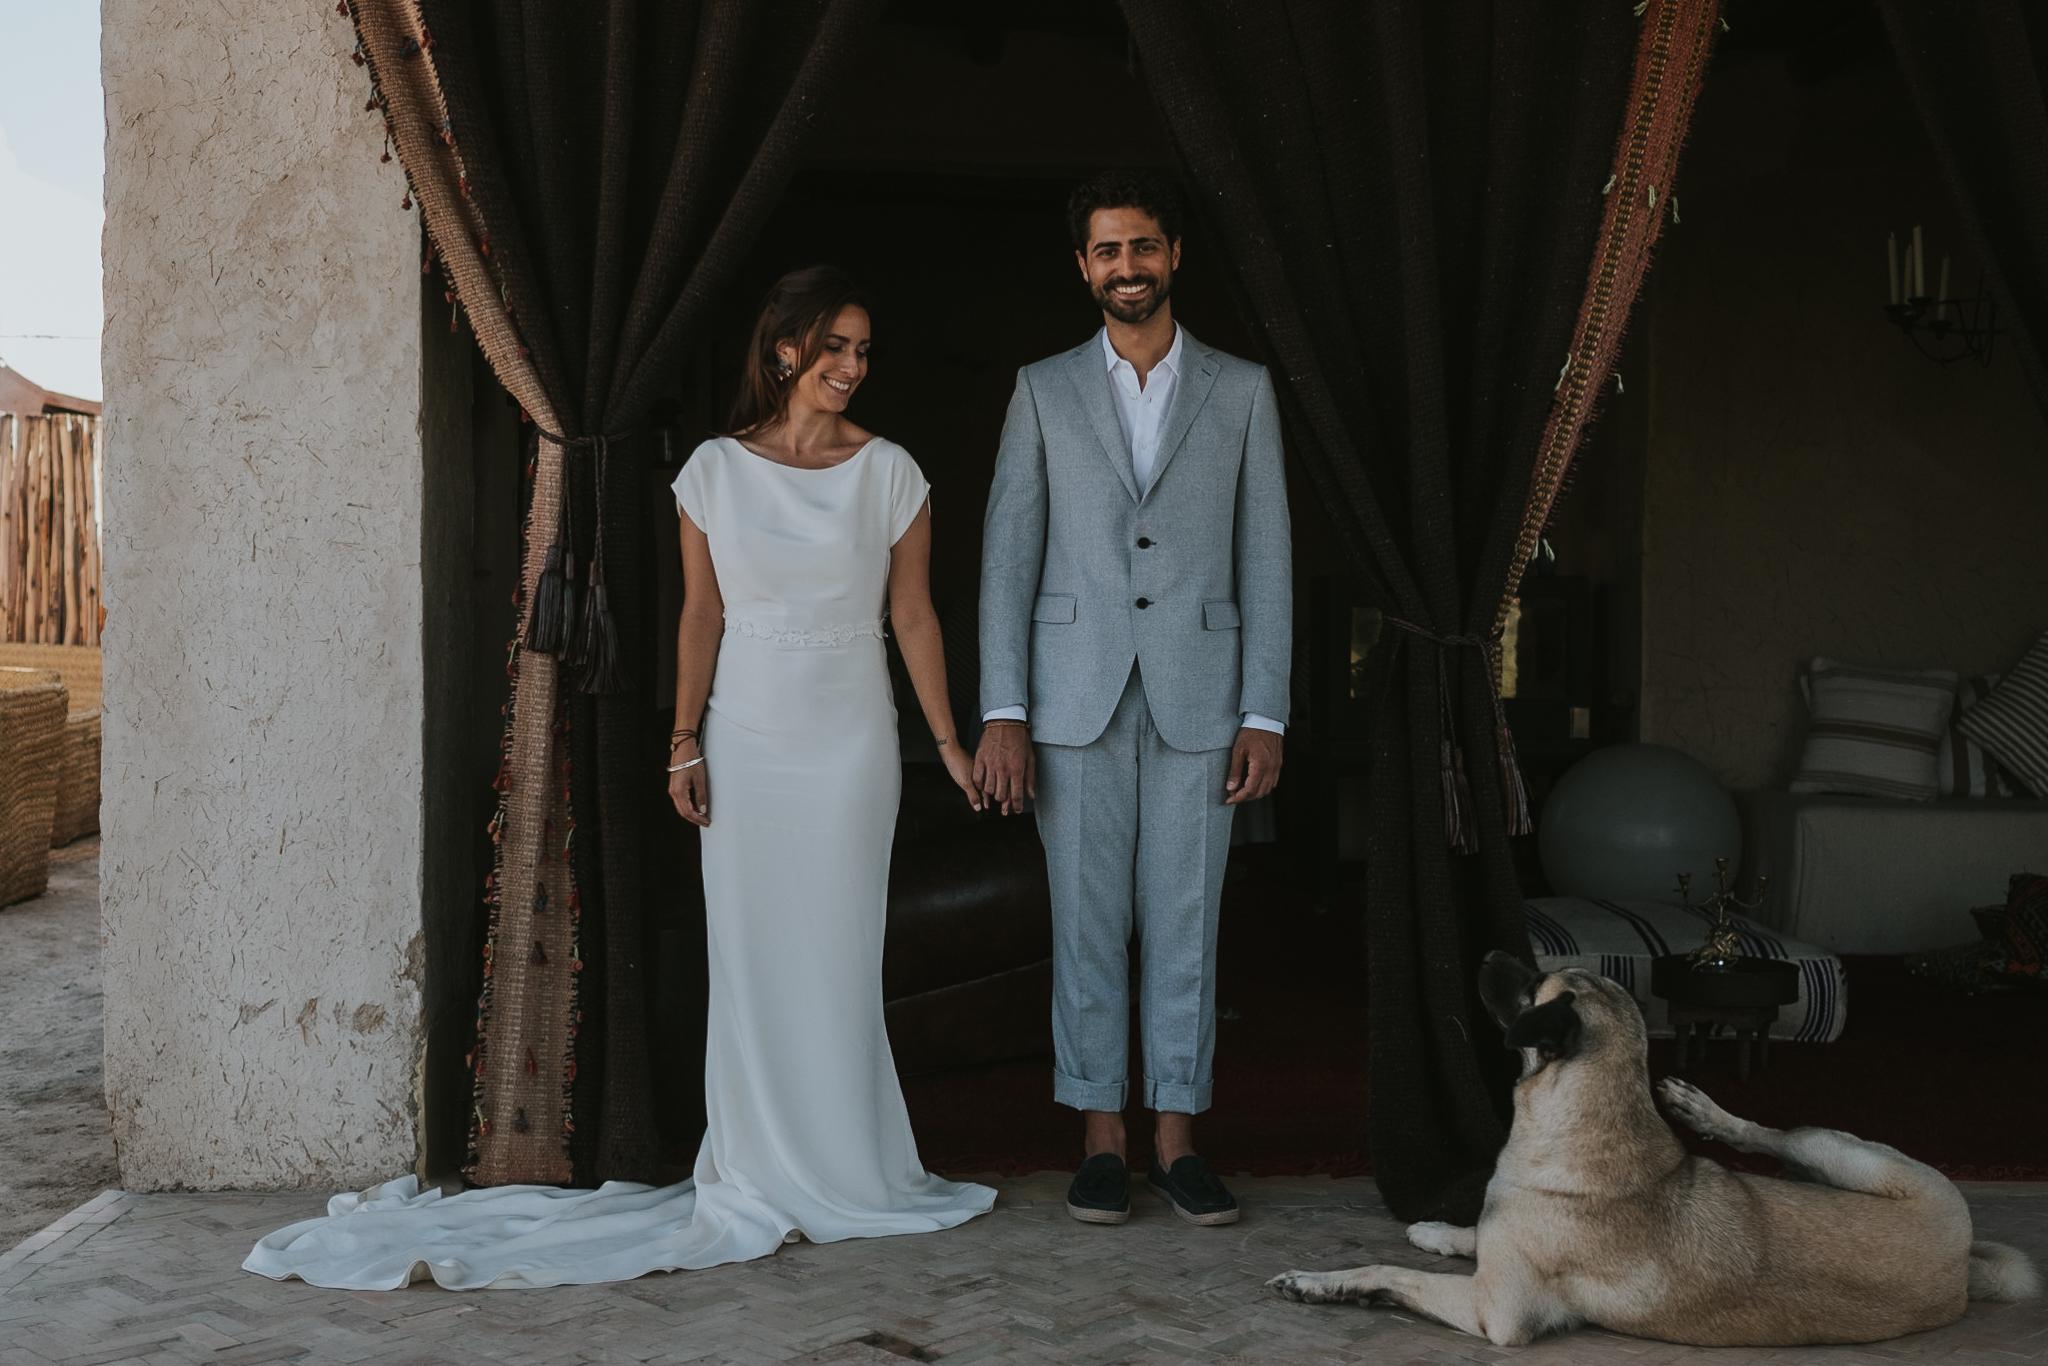 CRAIG-NICHOLAS-BERKSHIRE-WEDDING-PHOTOGRAHY (14 of 26).jpg